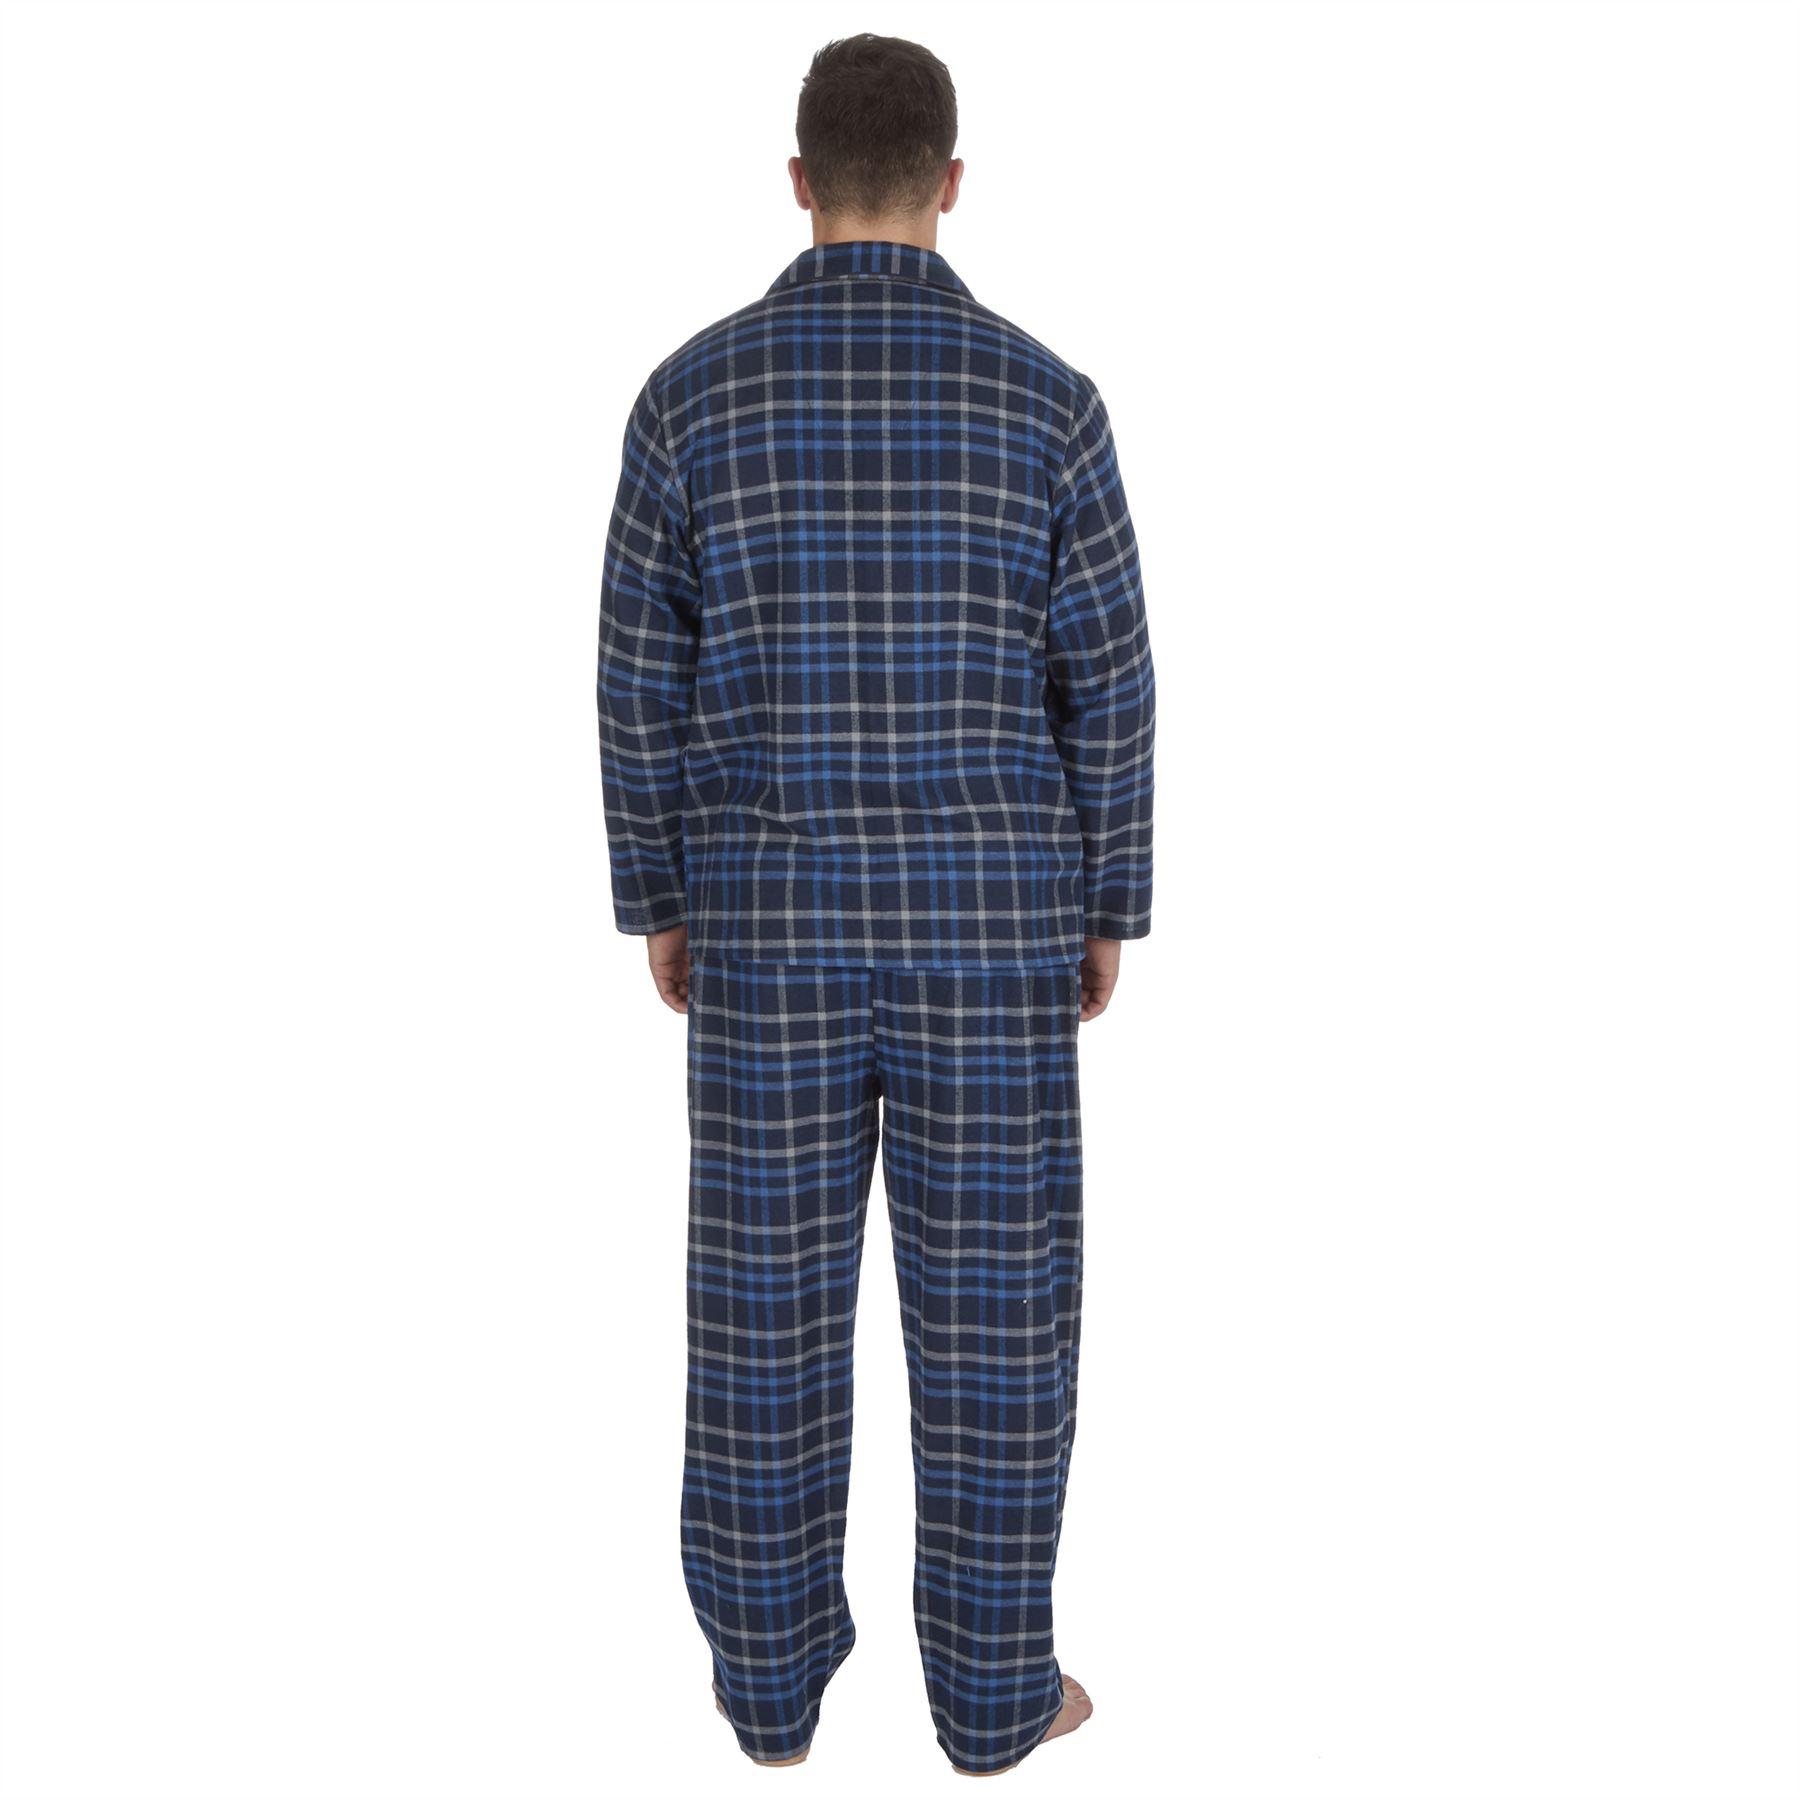 thumbnail 10 - Mens-Boys-100-Cotton-Flannel-Long-Sleeved-Pyjamas-Pyjama-Set-Check-Size-M-XXL